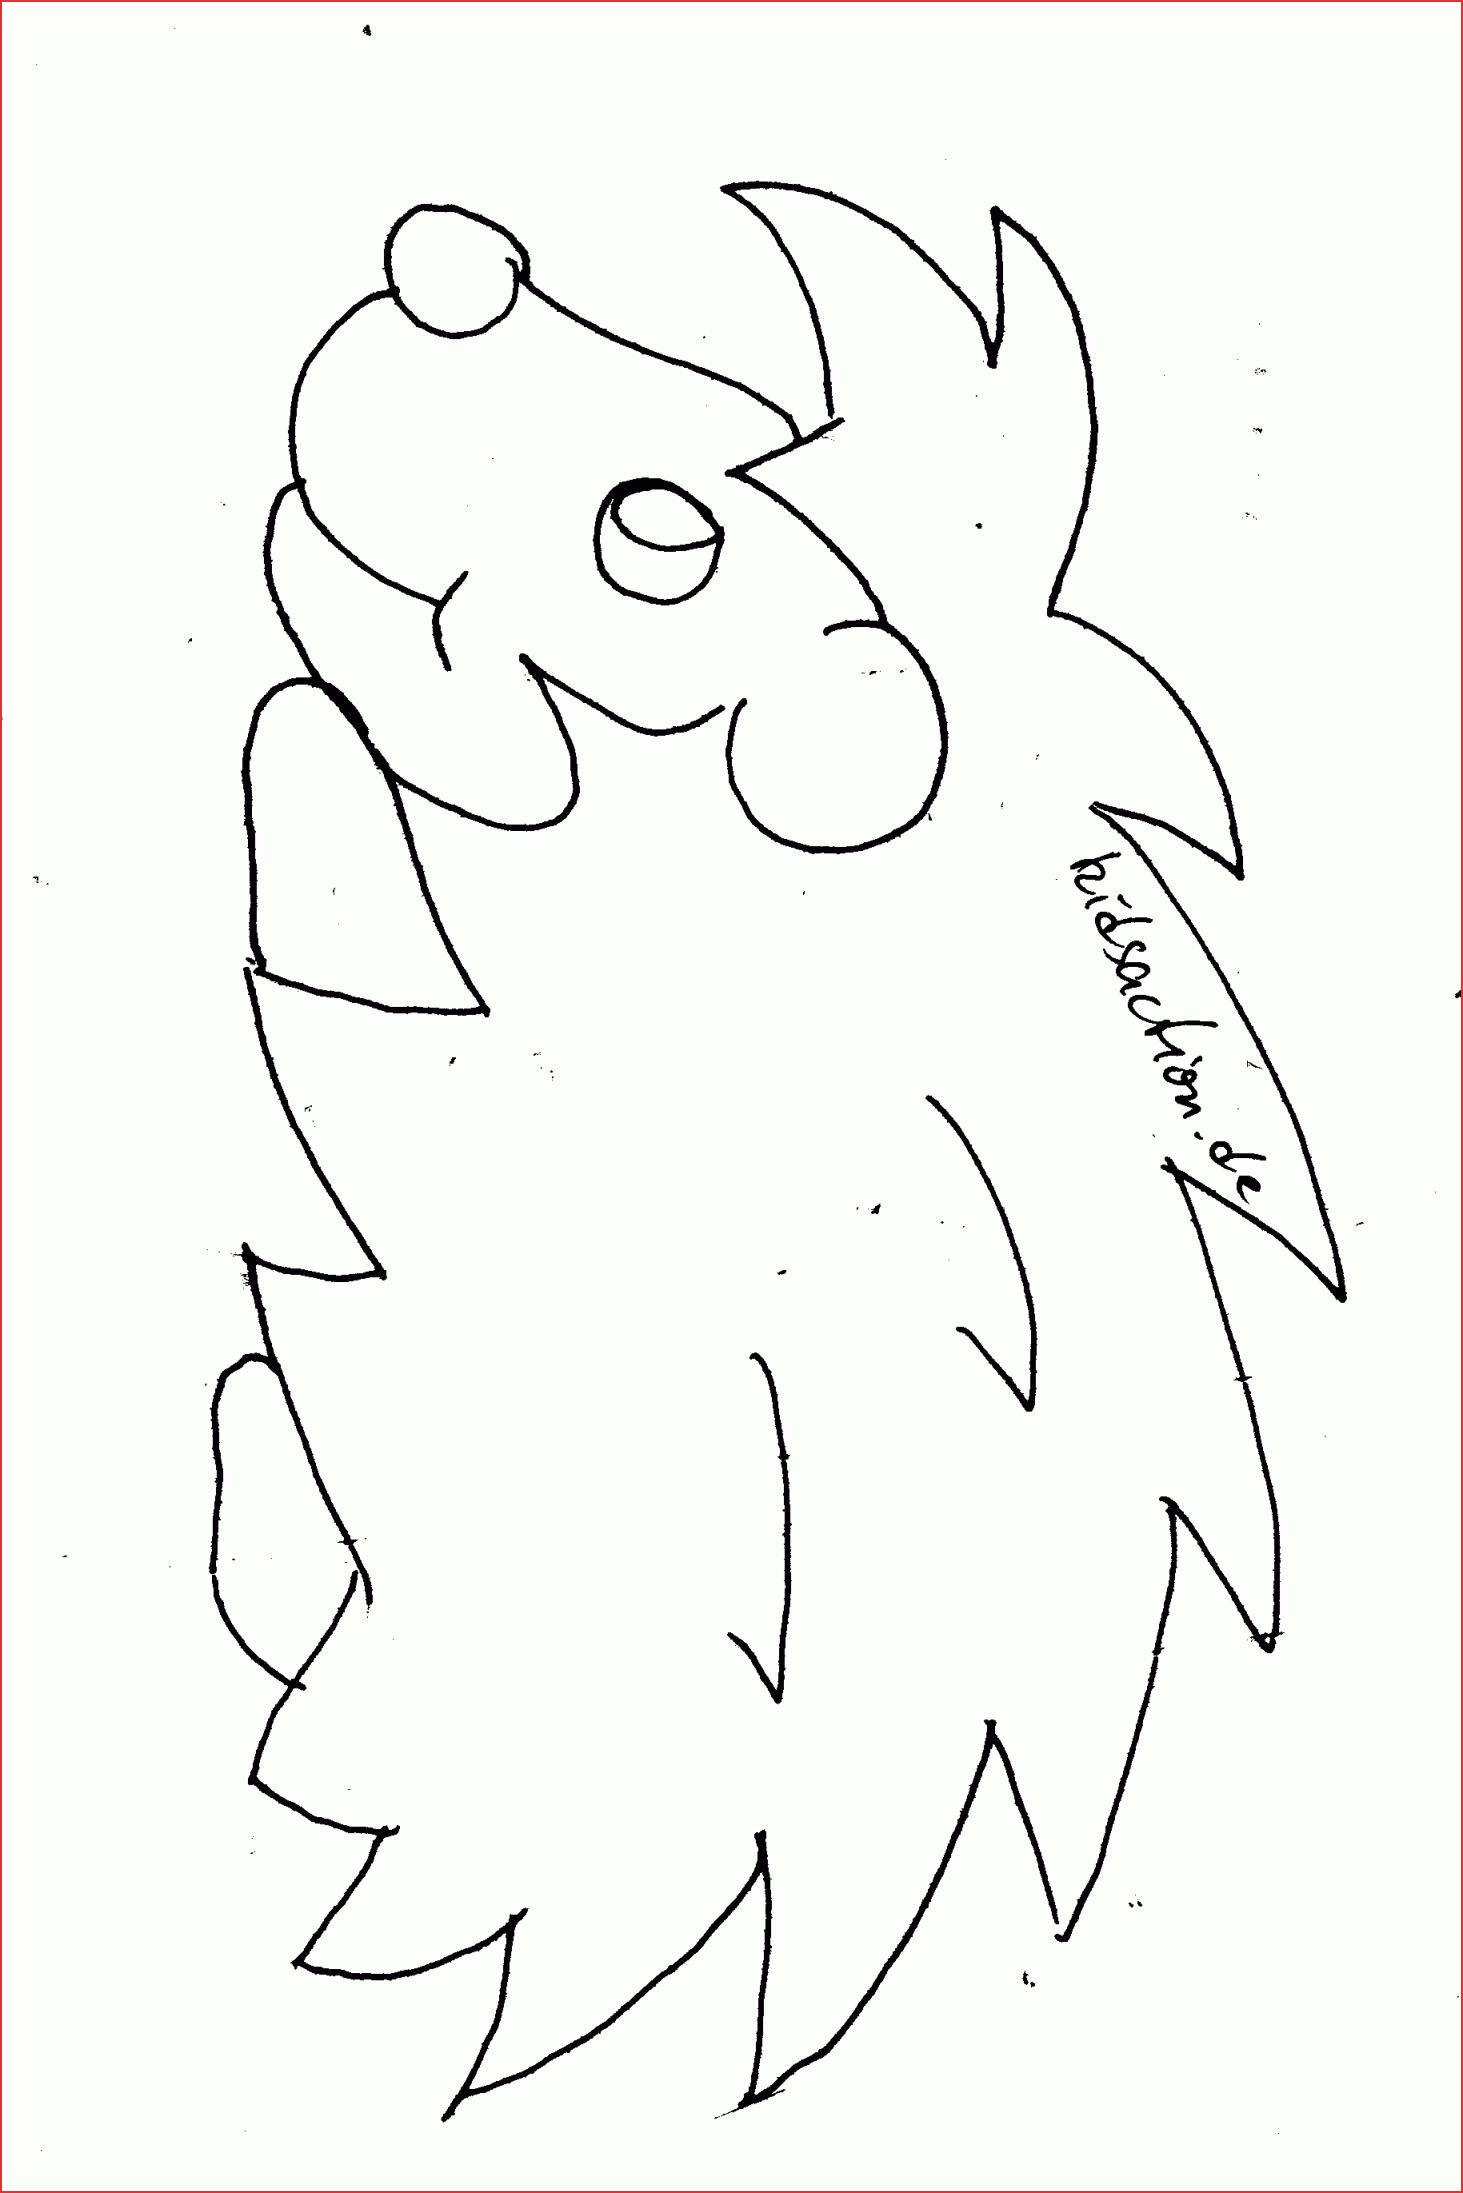 Malvorlagen Pokemon Glurak Frisch Mandala Pokemon Ausdrucken Bild